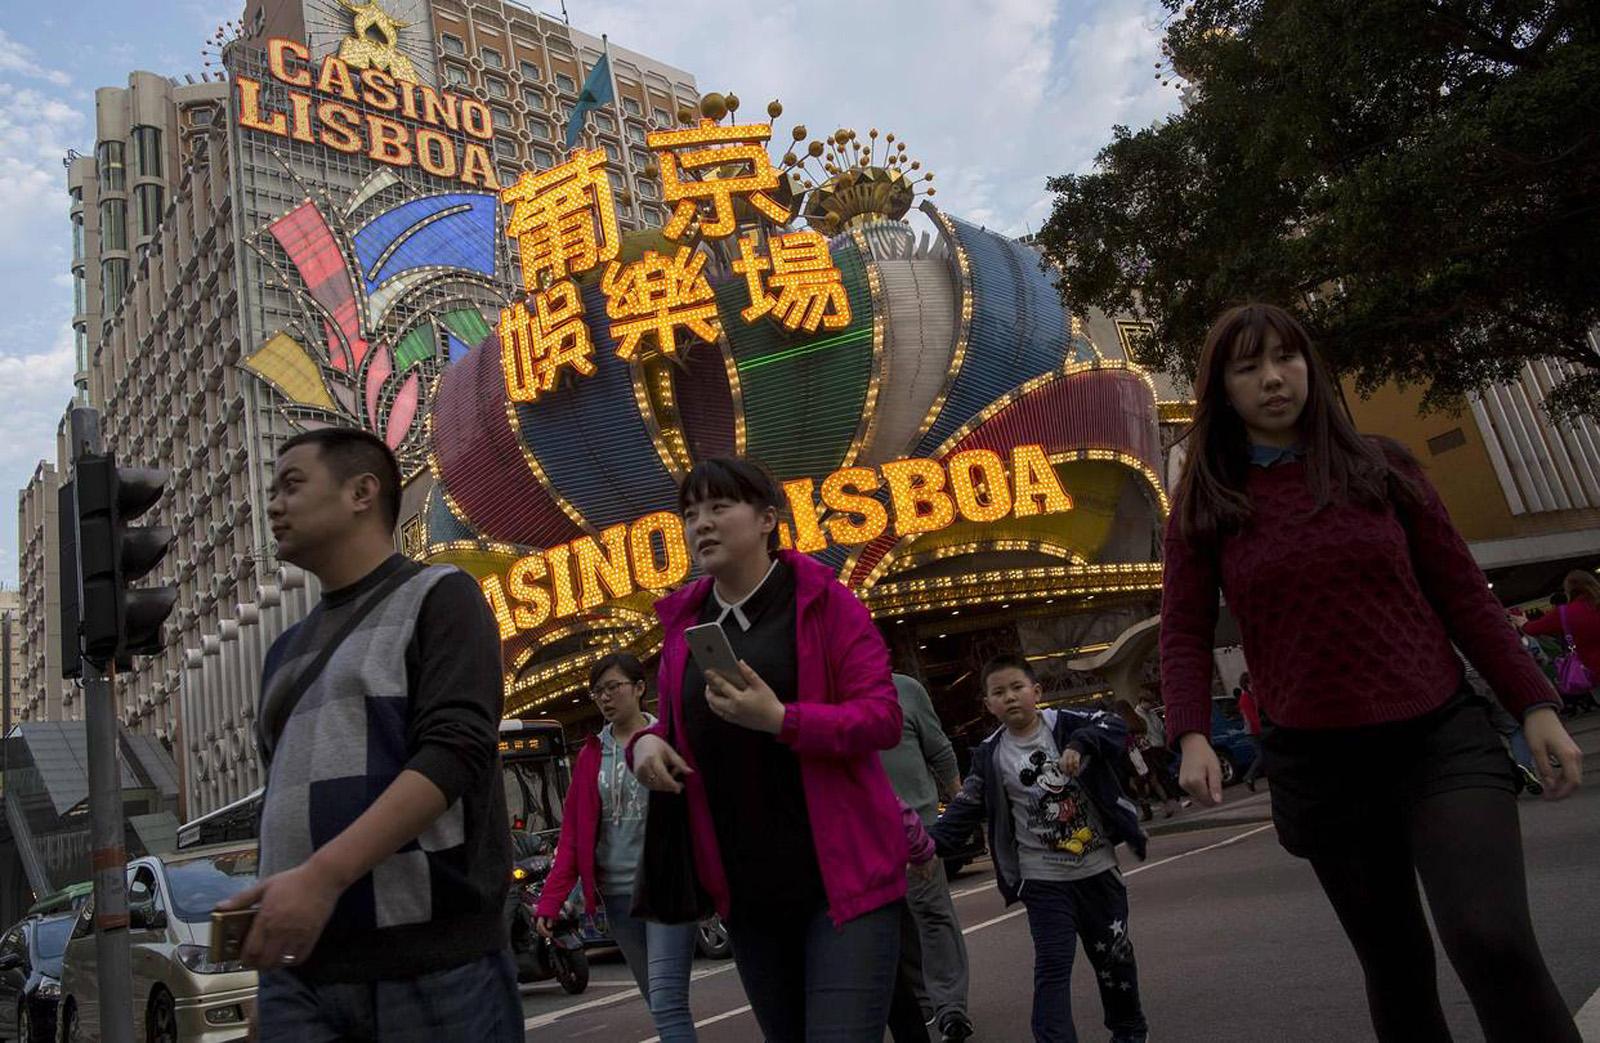 Macau gambling revenue rises 18 percent in March as high rollers return